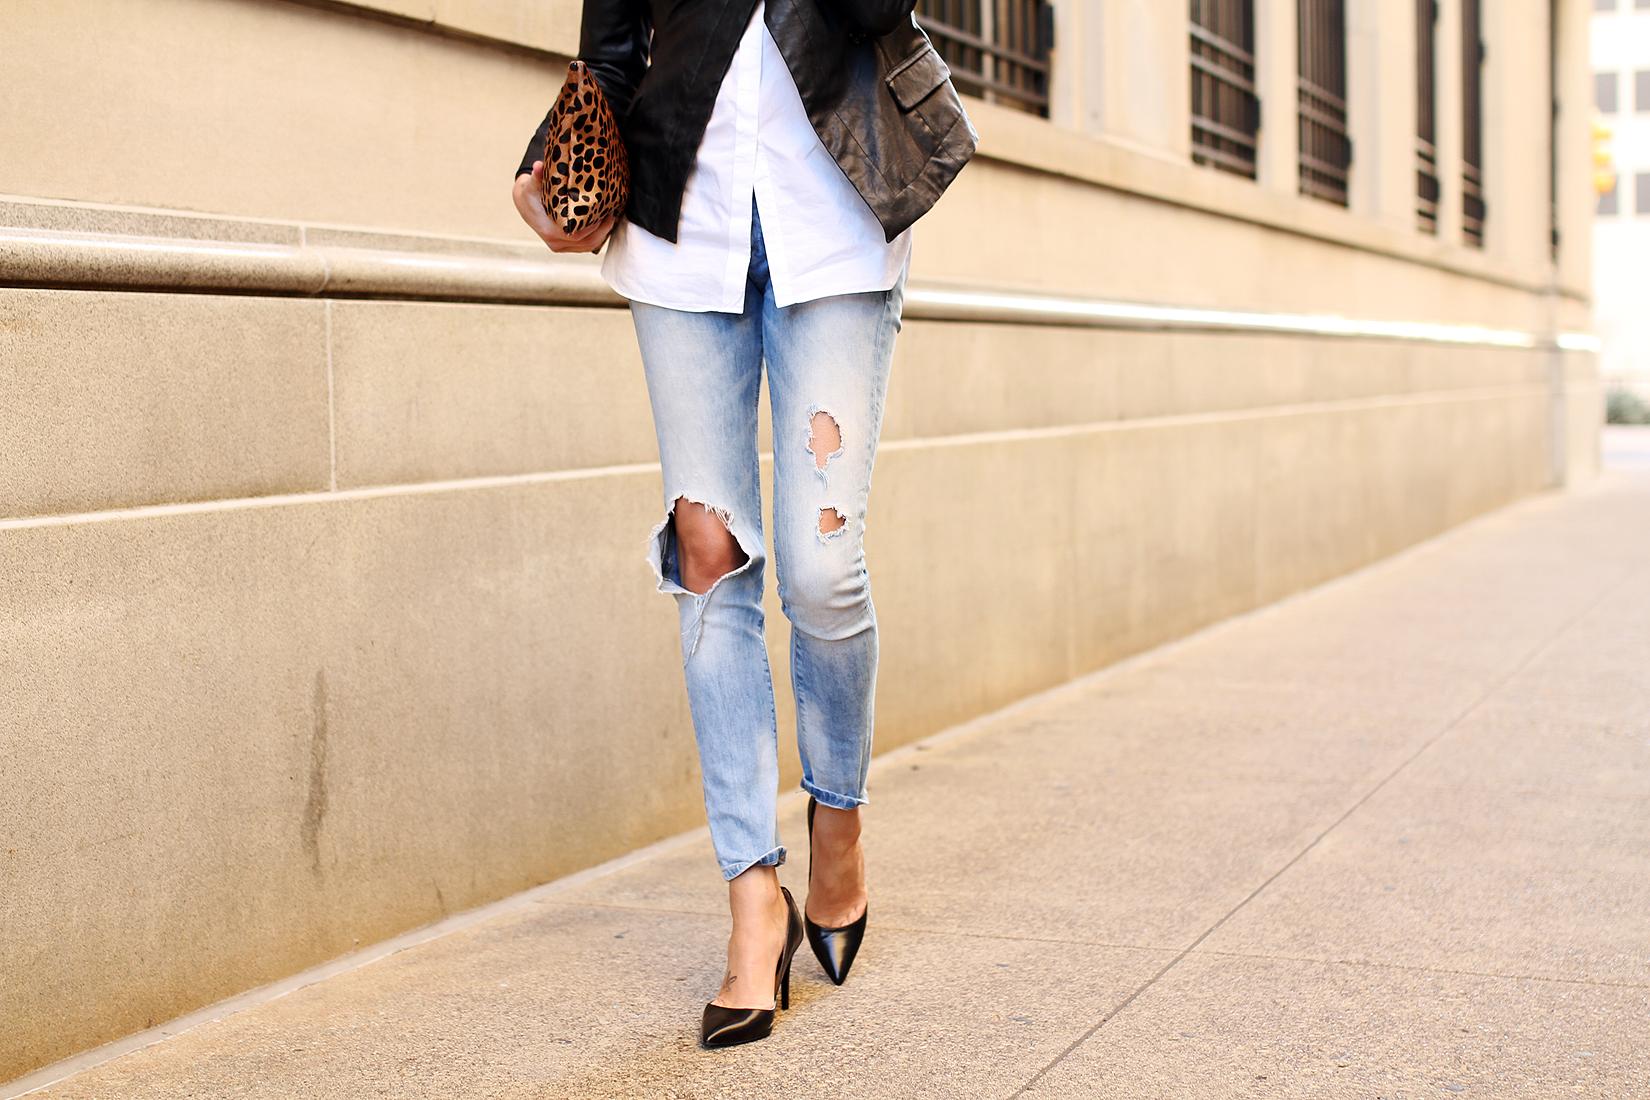 fashion-jackson-denim-ripped-skinny-jeans-black-pumps-leopard-clutch